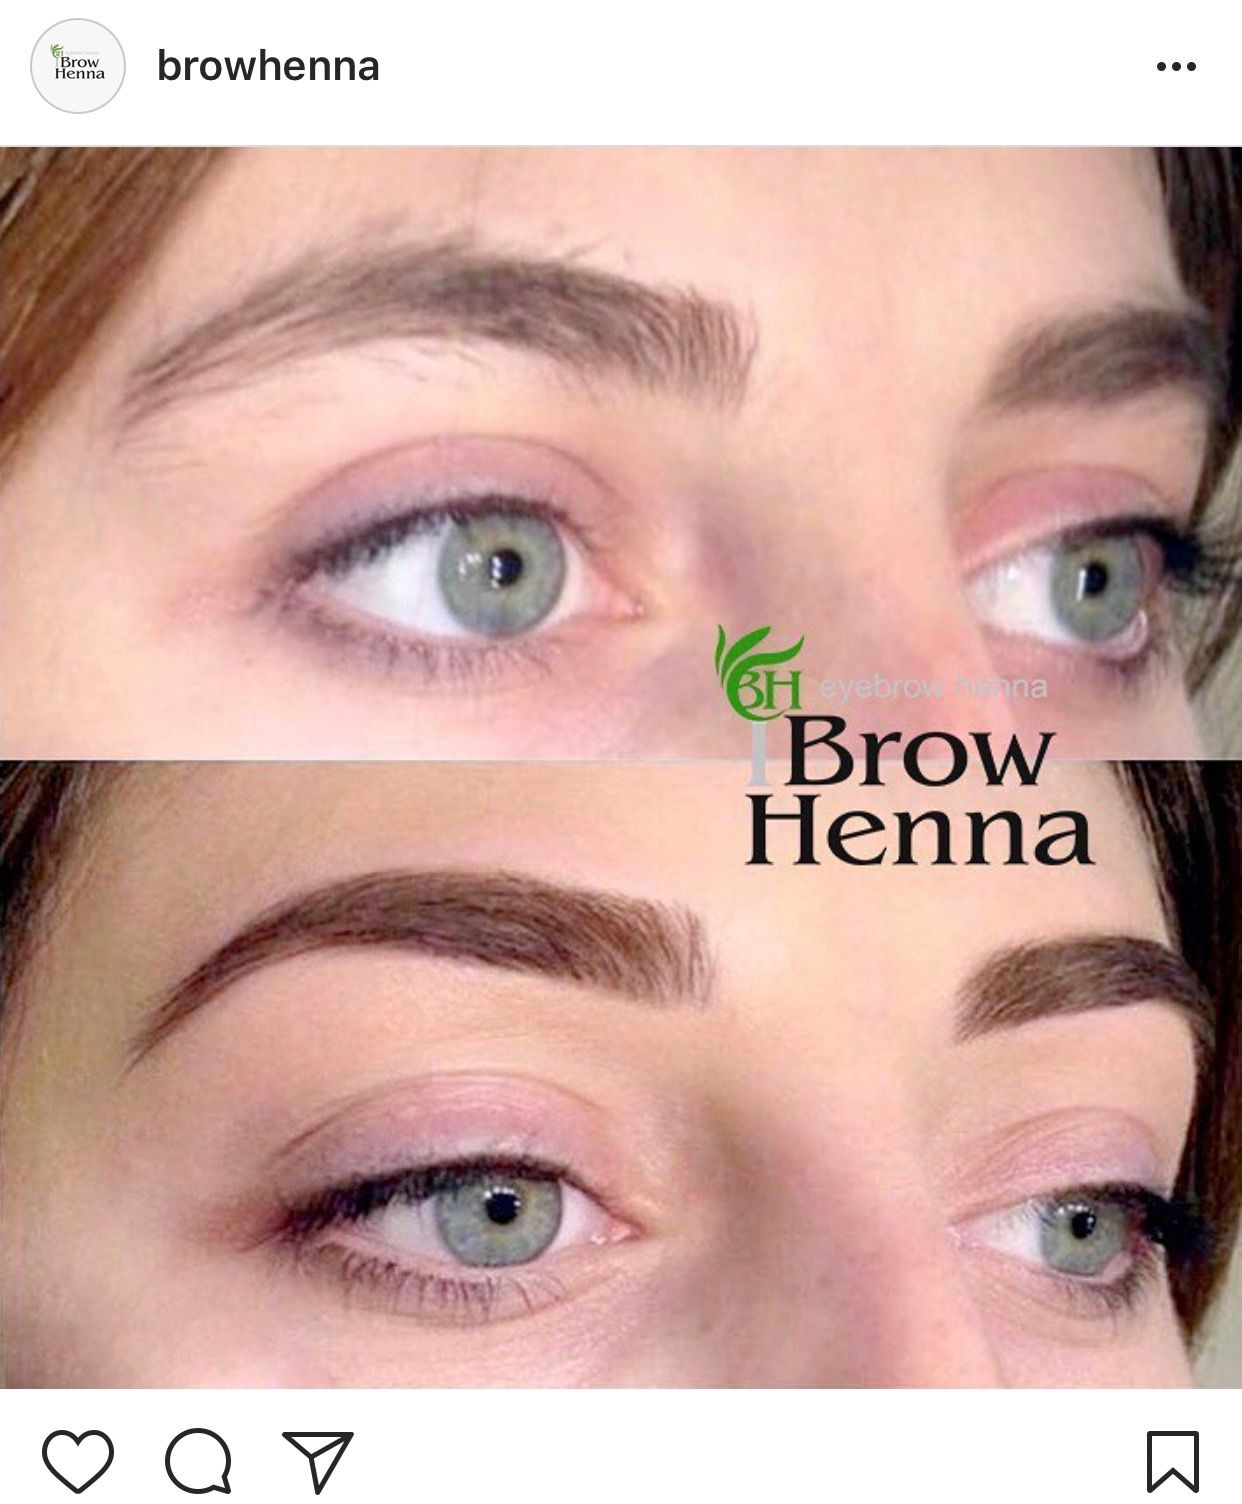 Pin By Irina Levchuk On Bh Brow Henna The Best Organic Tint In 2019